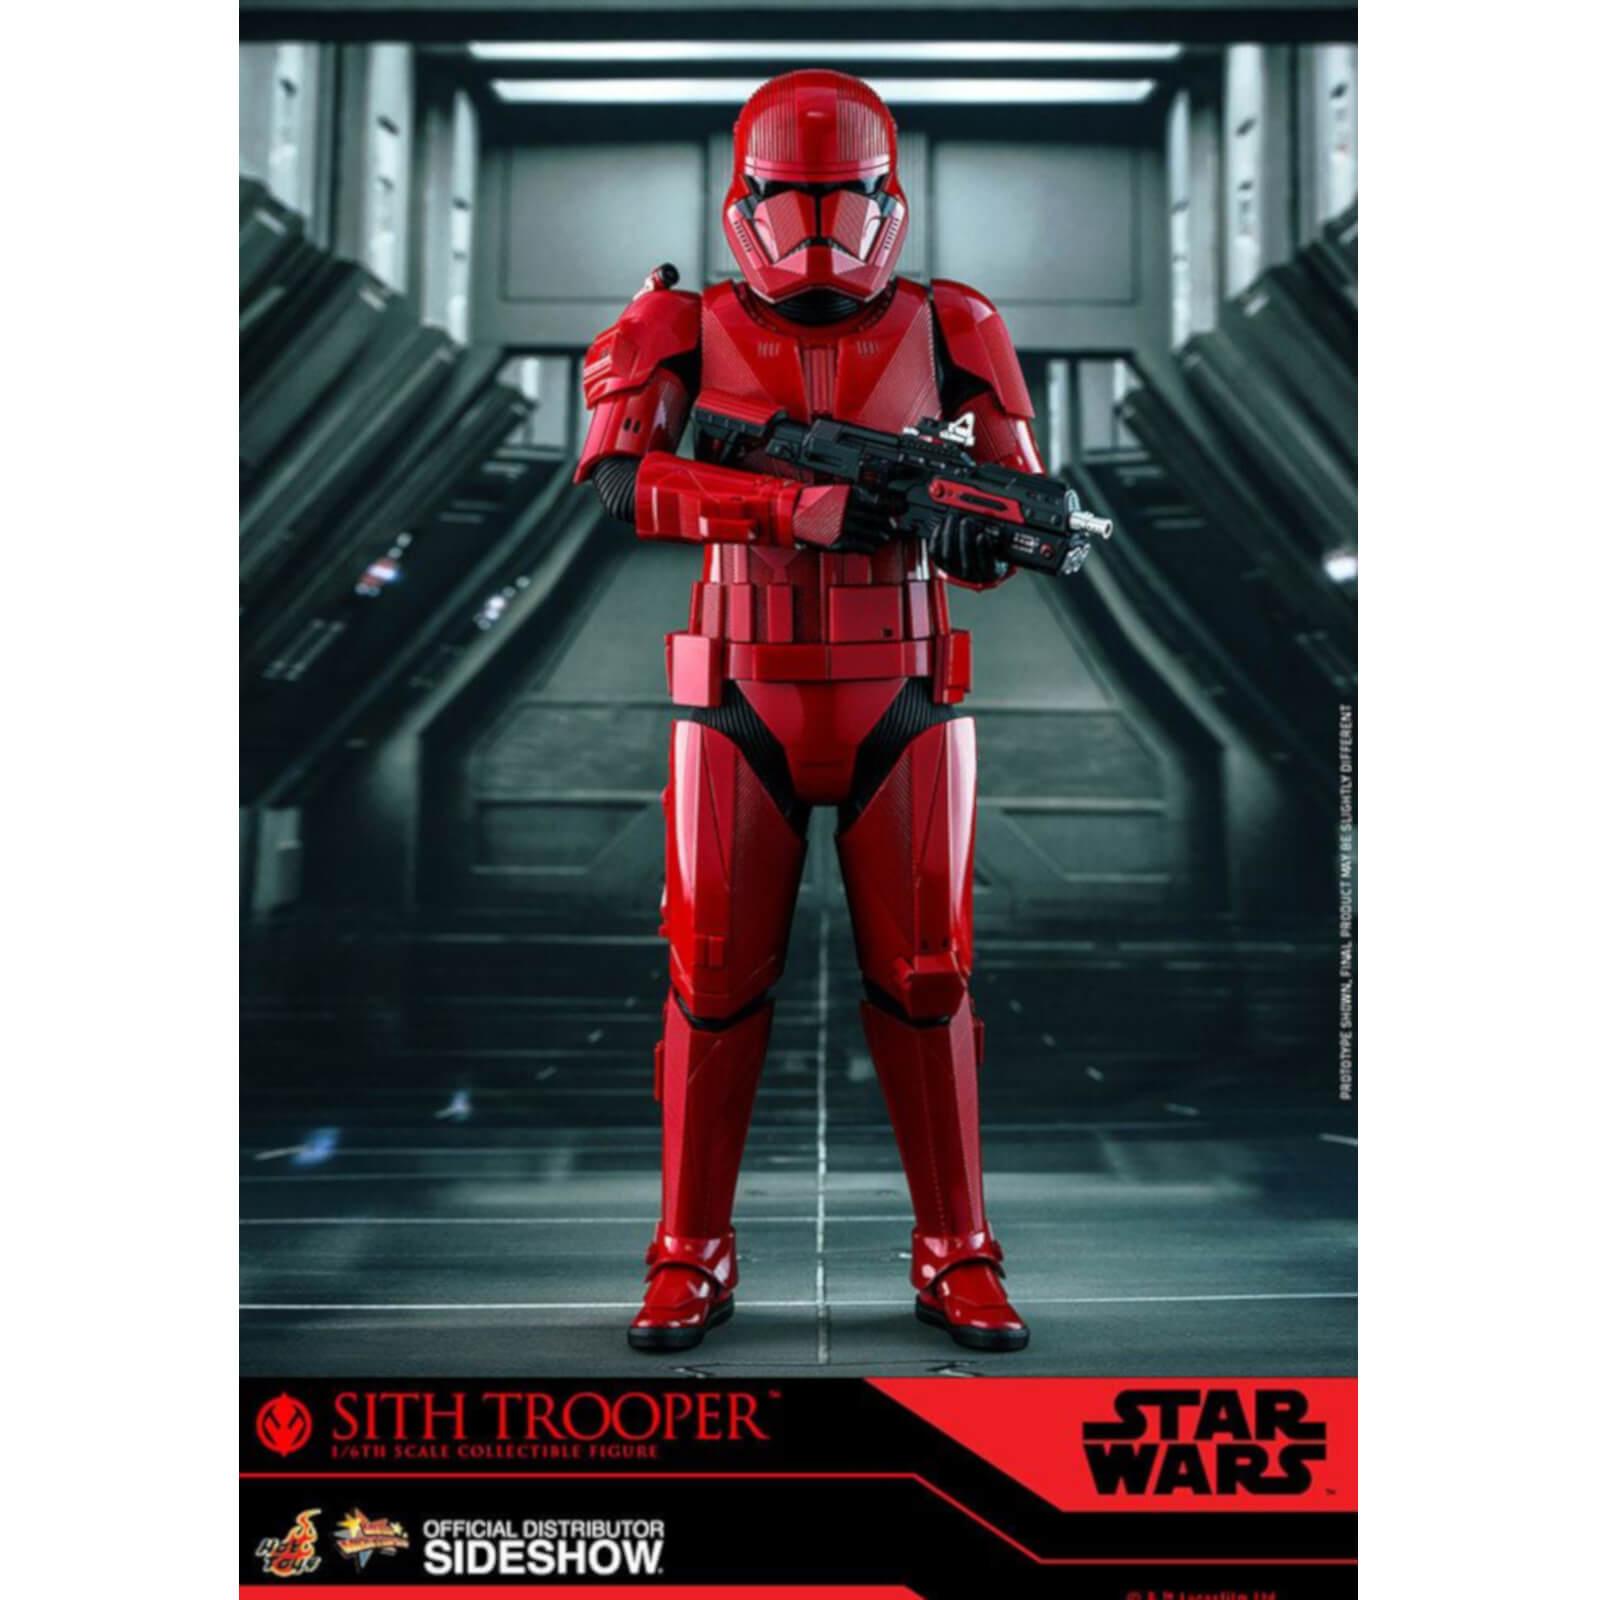 Hot Toys Star Wars Episode IX Movie Masterpiece Action Figur 1/6 Sith Trooper 31cm